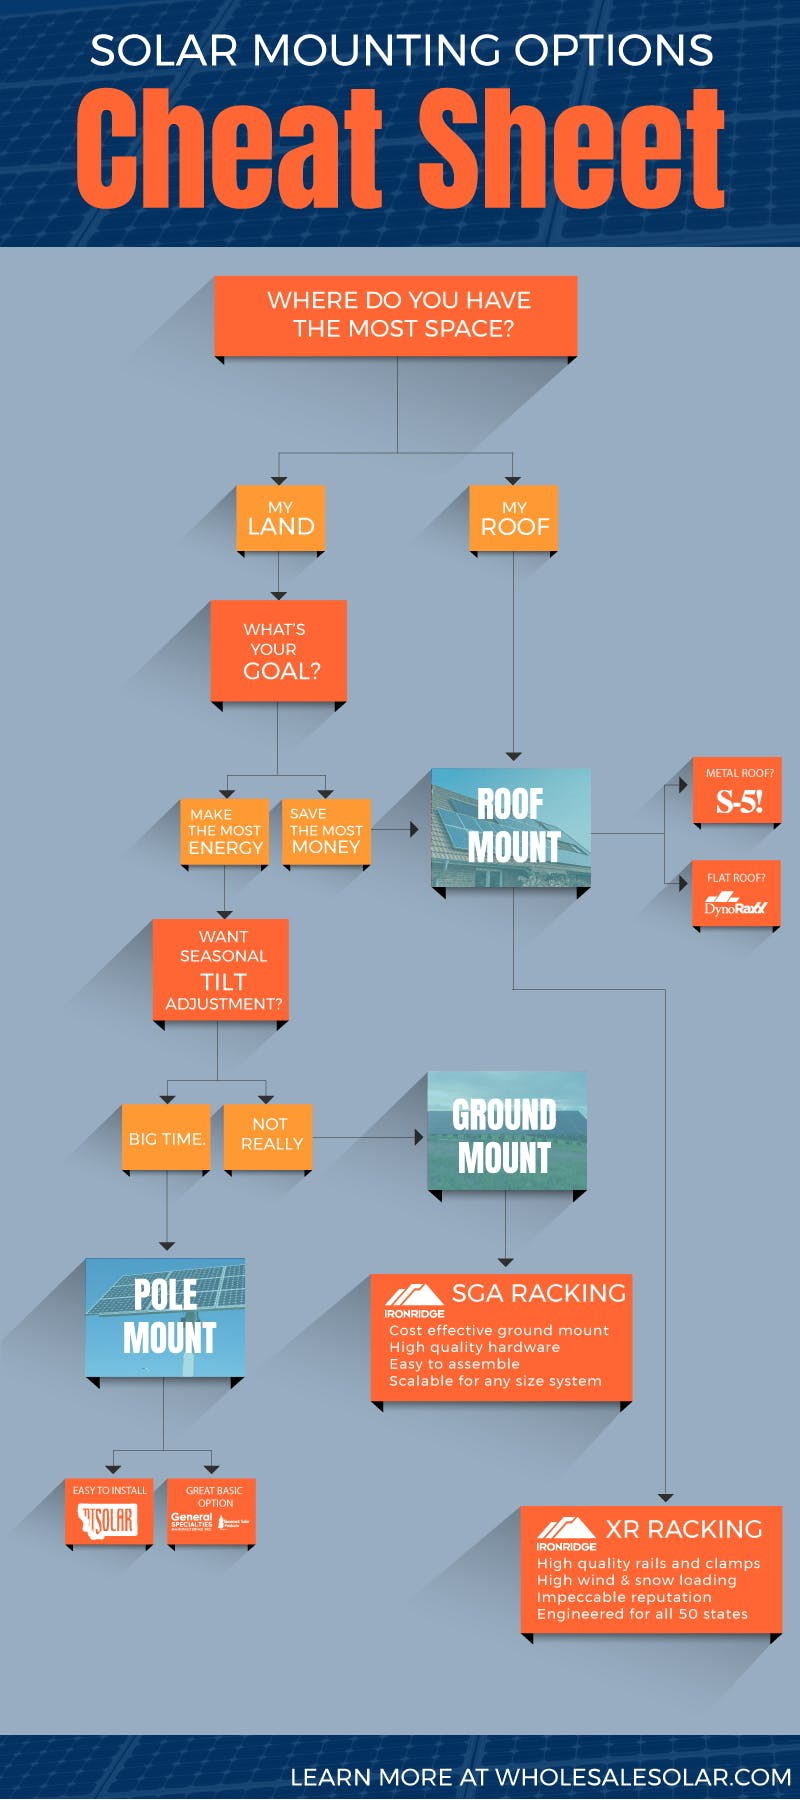 Solar mounting options: cheat sheet